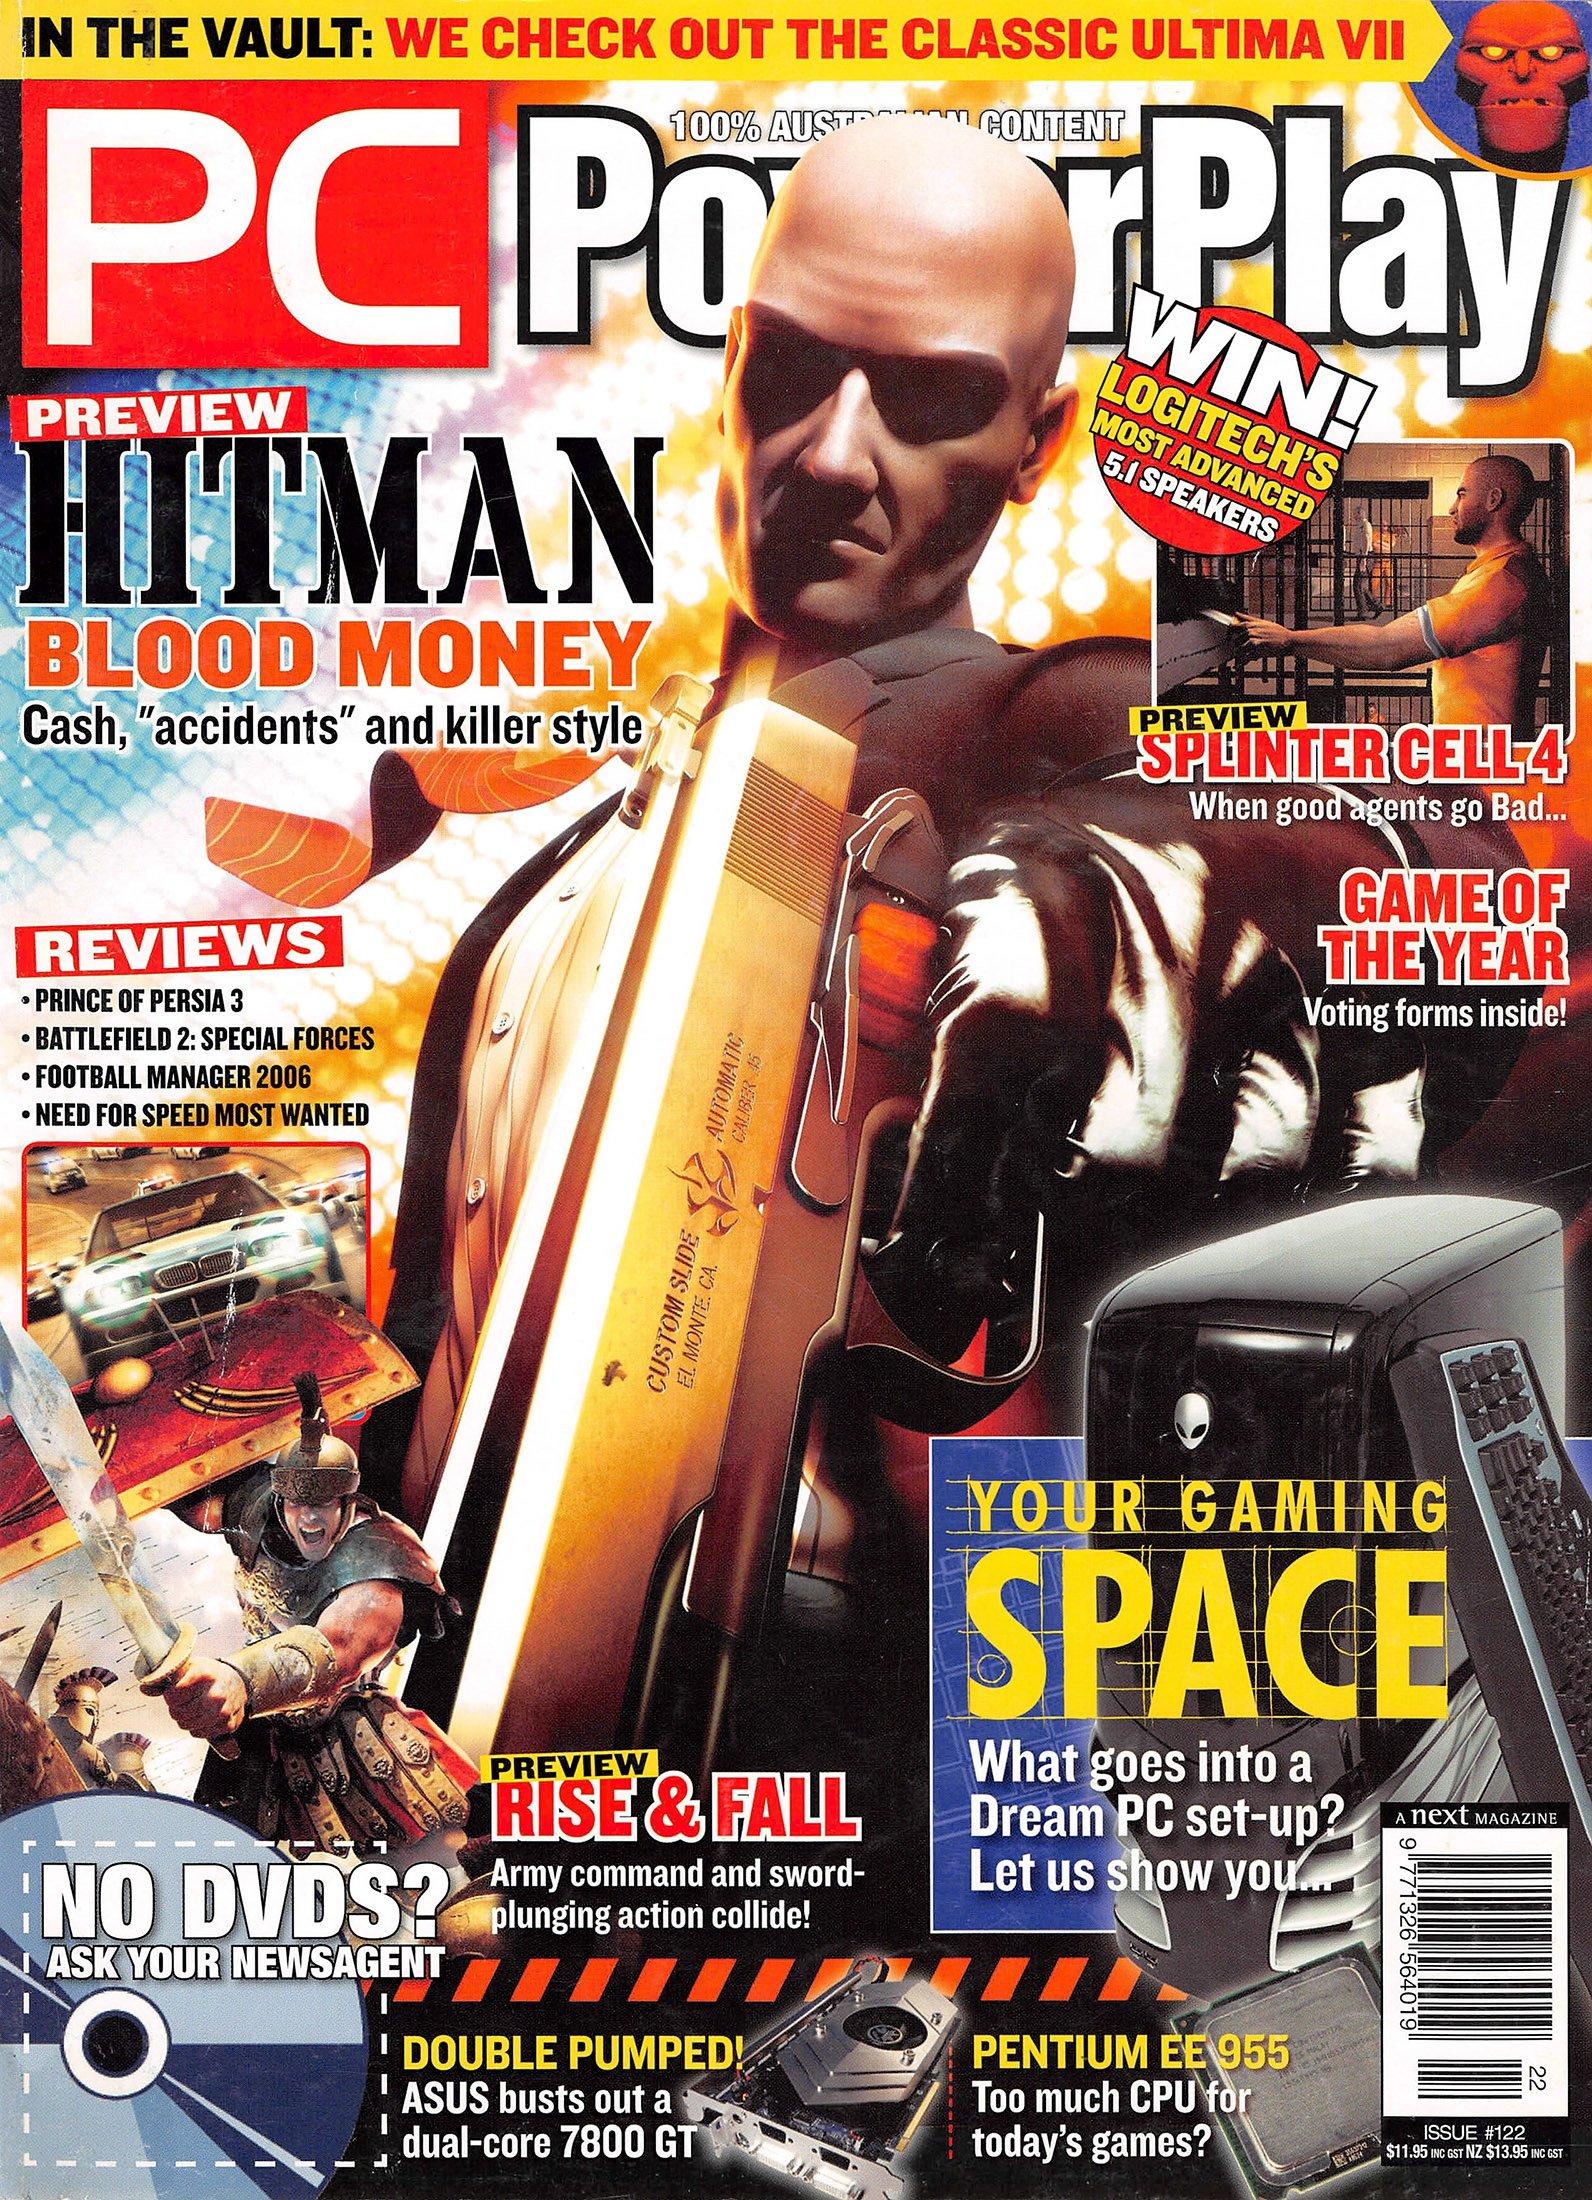 PC PowerPlay 122 (February 2006)